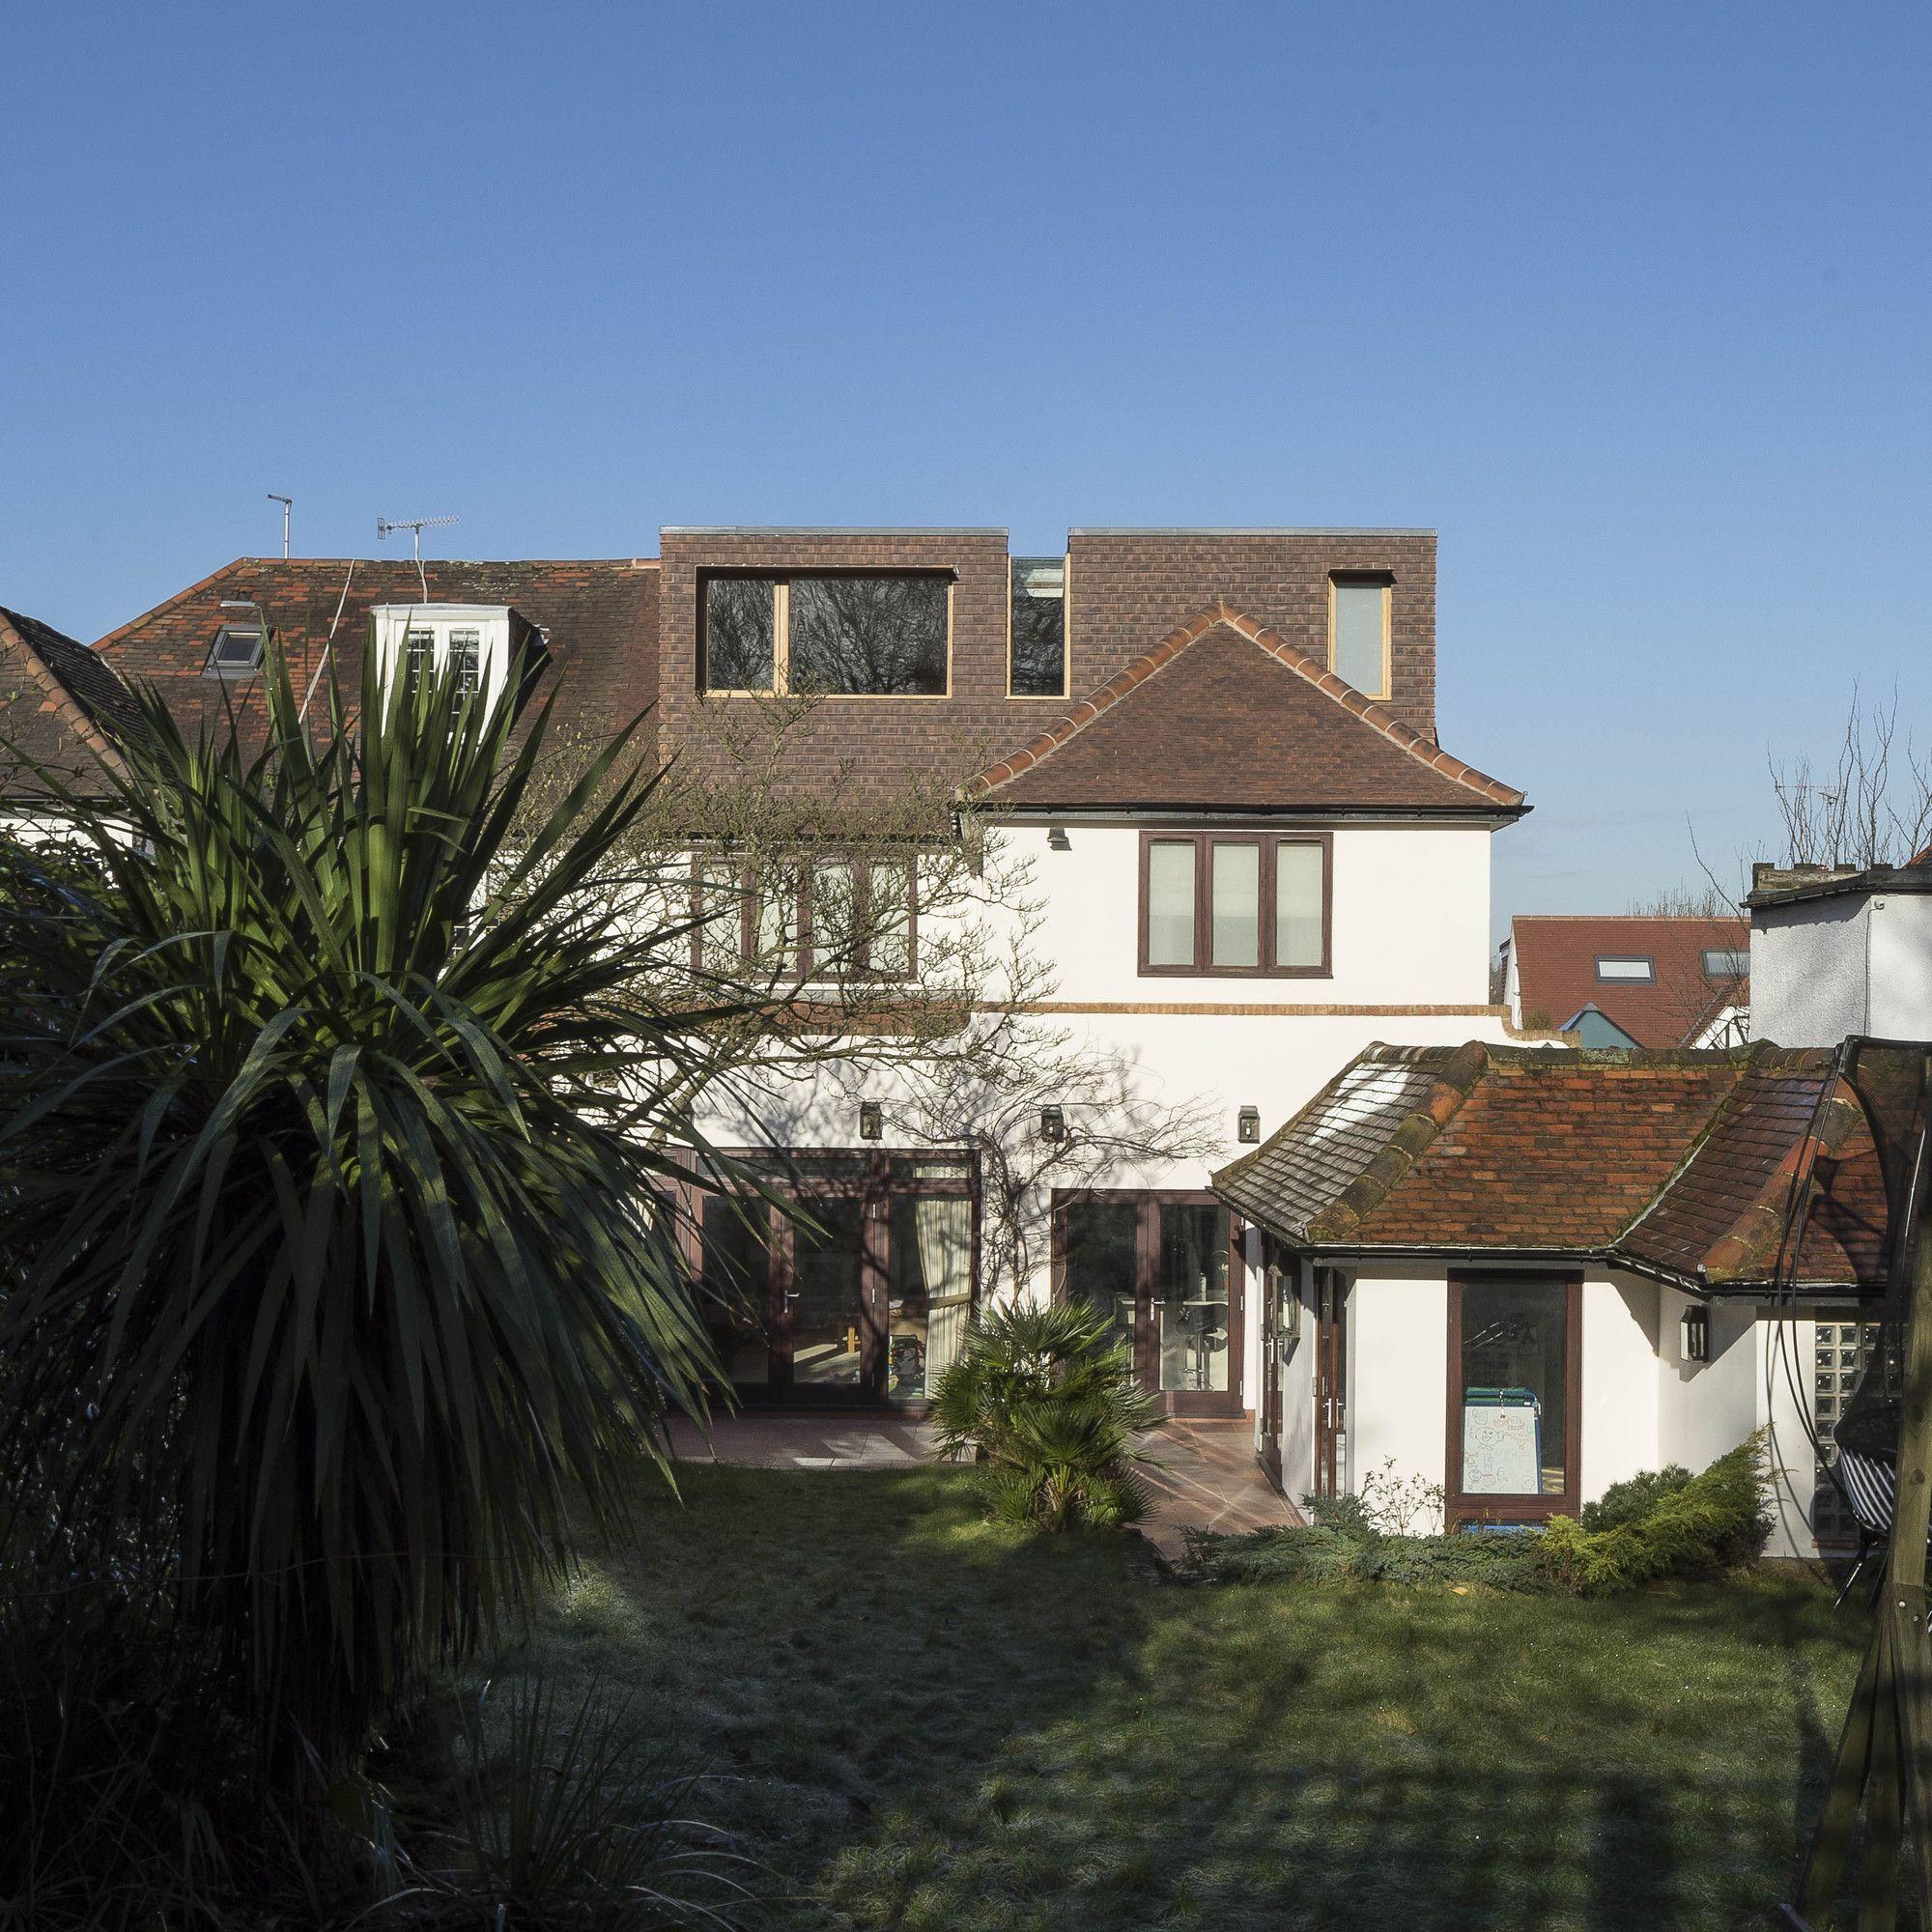 Gallery Of Finchley Loft Satish Jassal Architects 1 Loft Conversion Architecture Architecture House